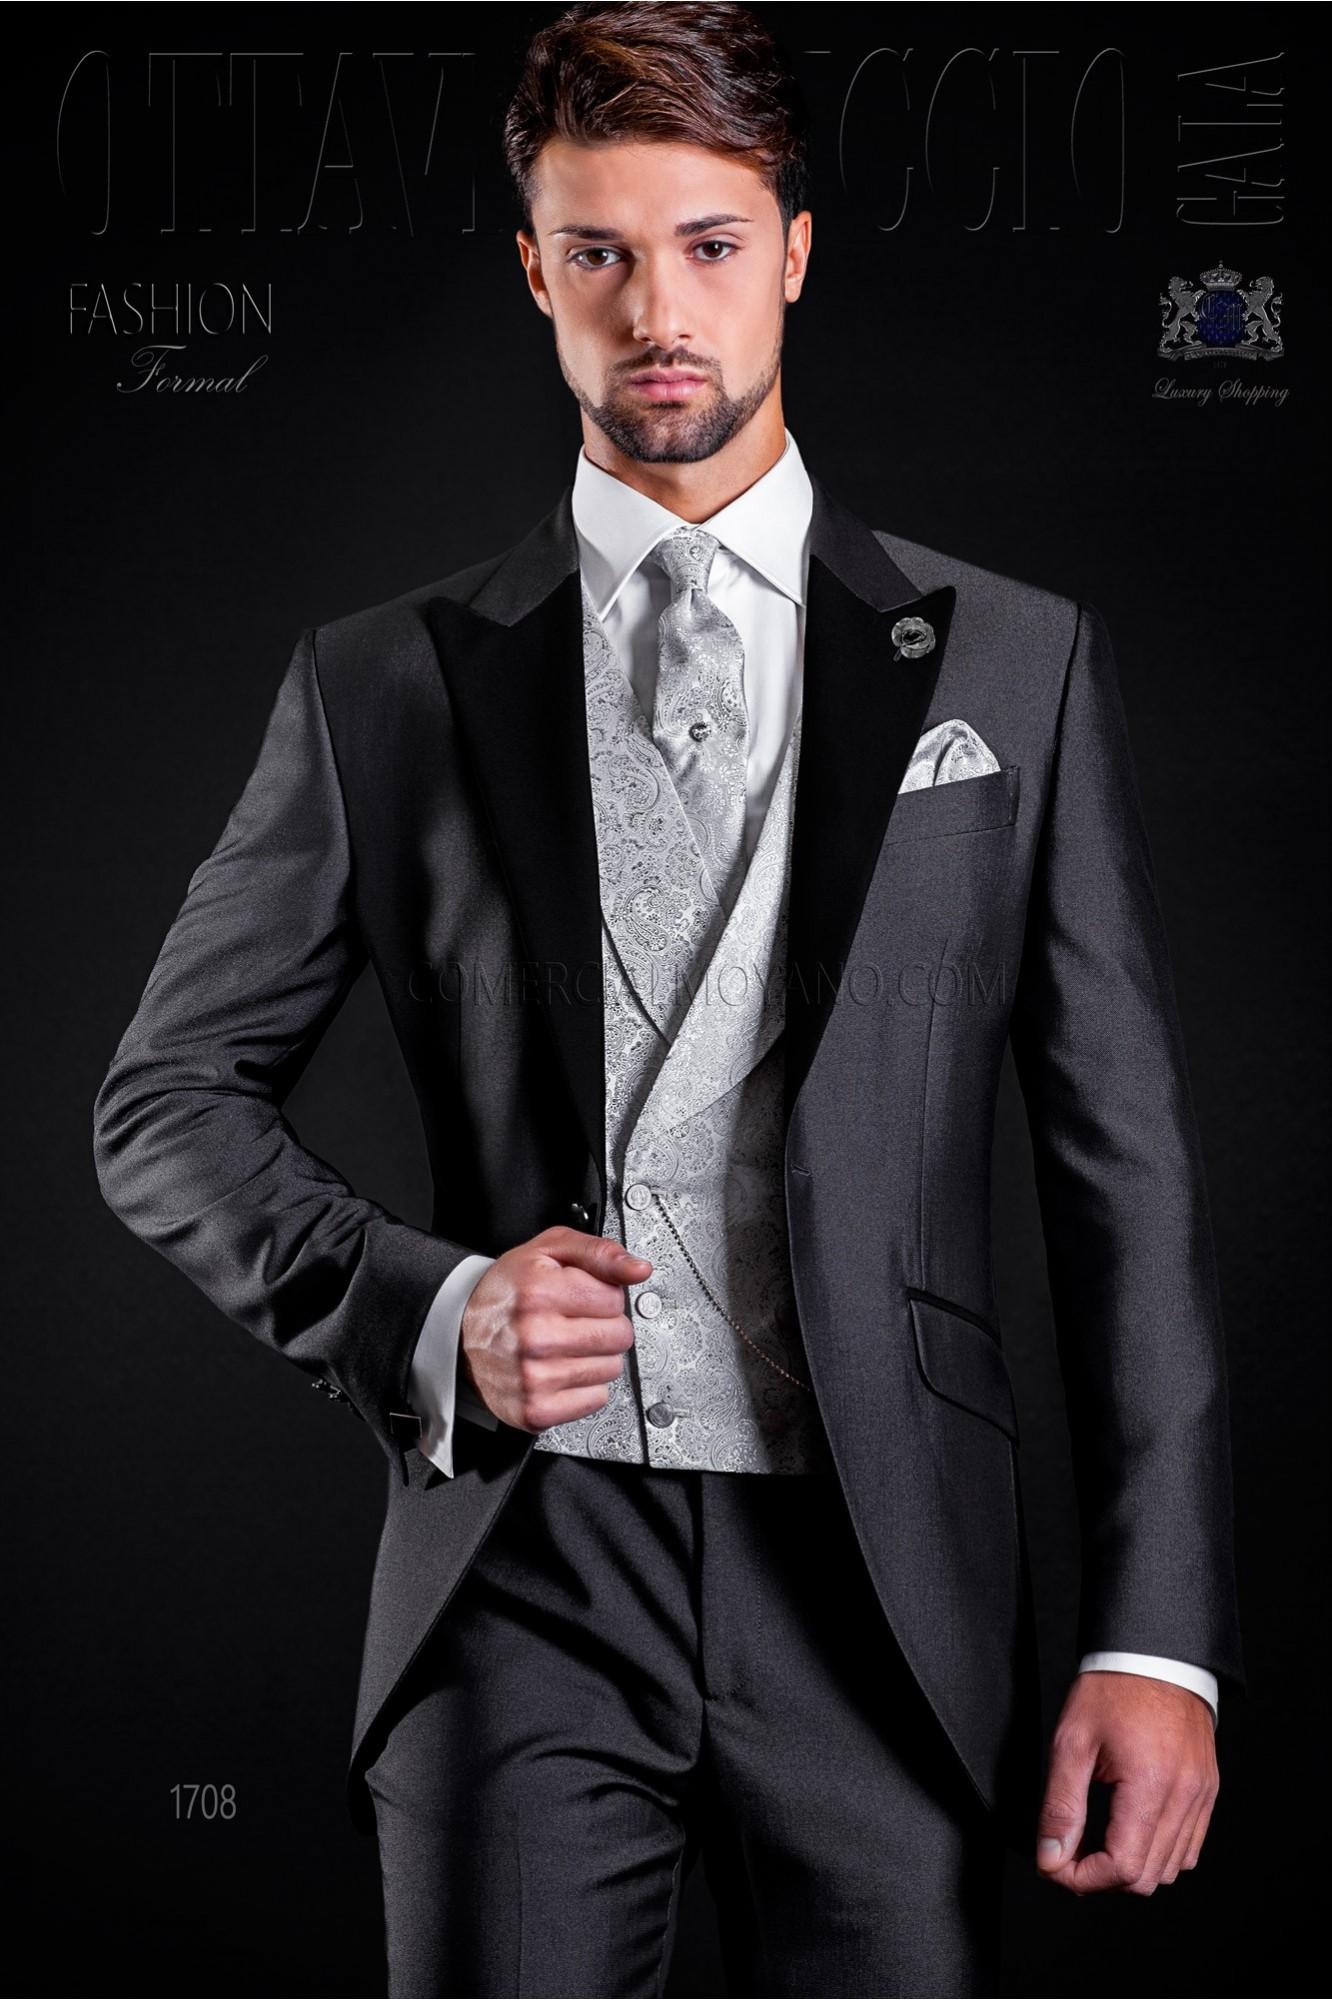 Traje de novio gris antracita con solapa raso negro modelo: 1708 Ottavio Nuccio Gala colección Fashion